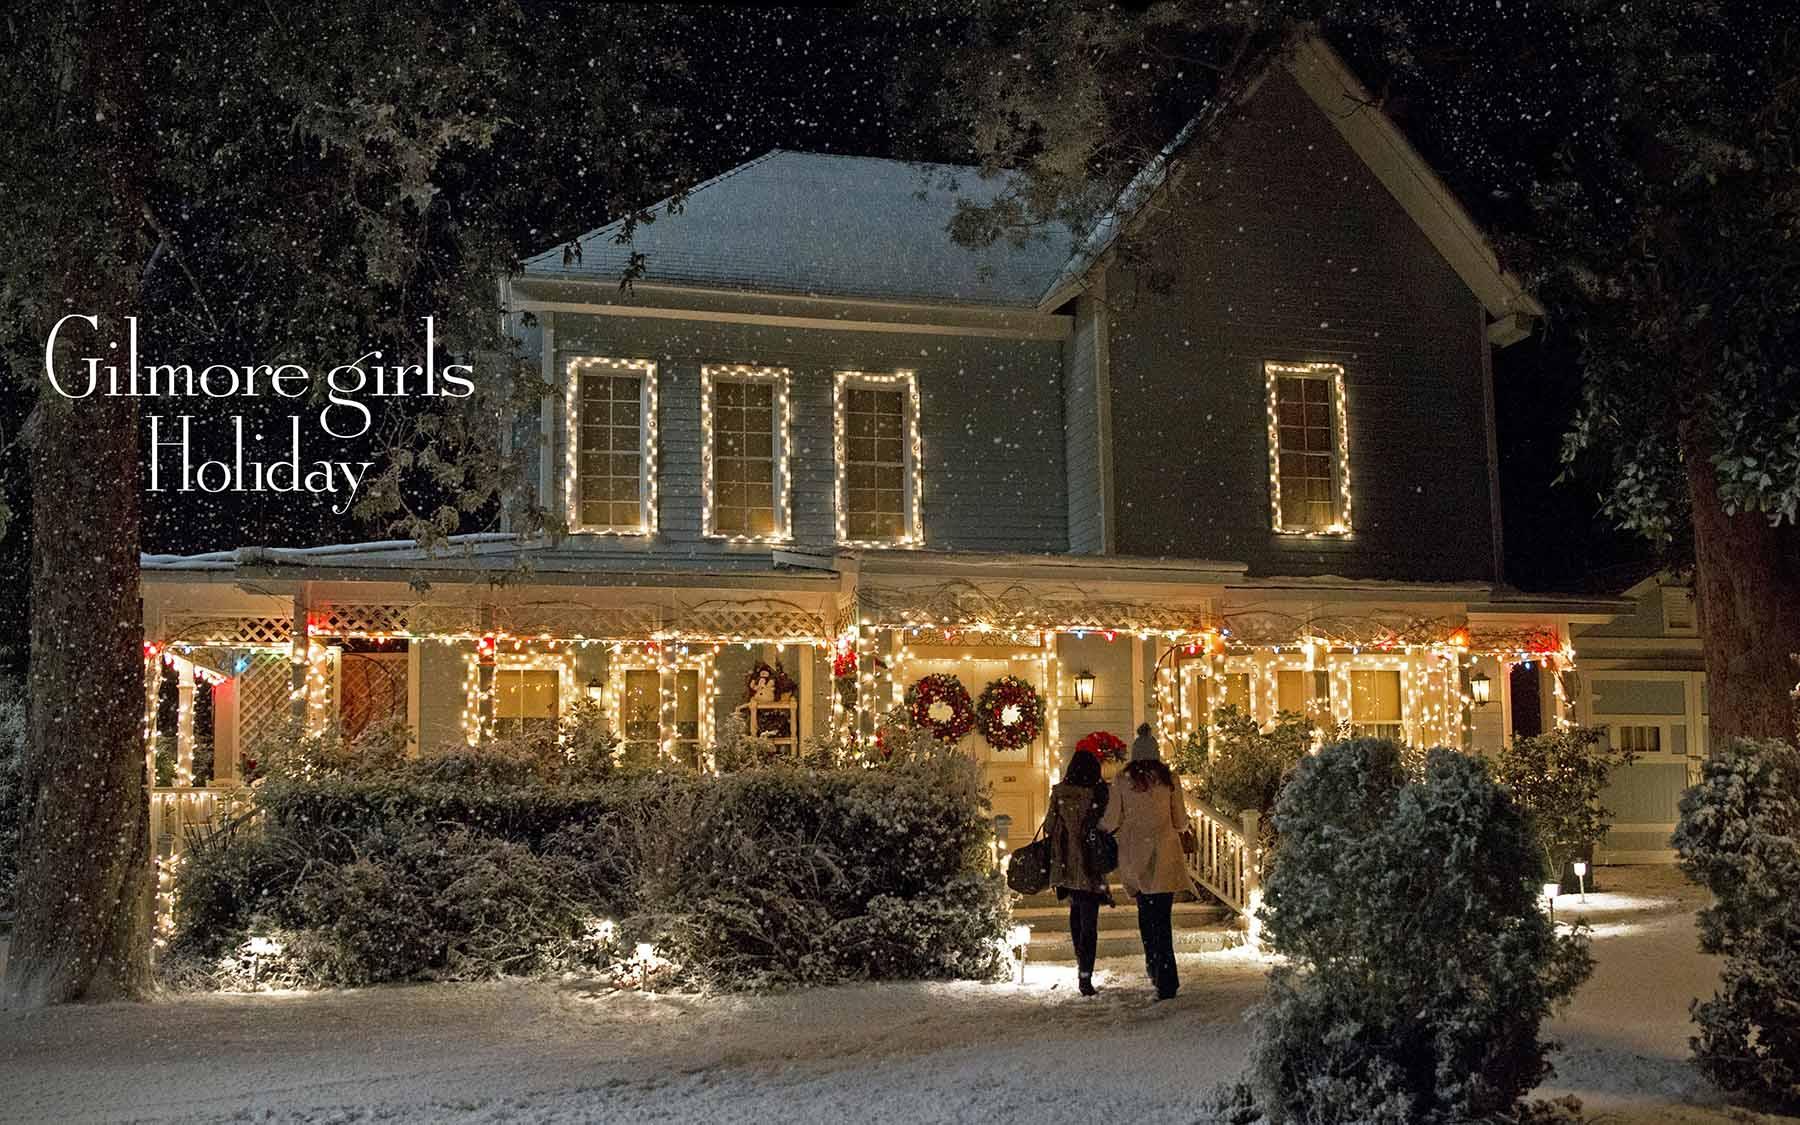 Gilmore Girls Holiday